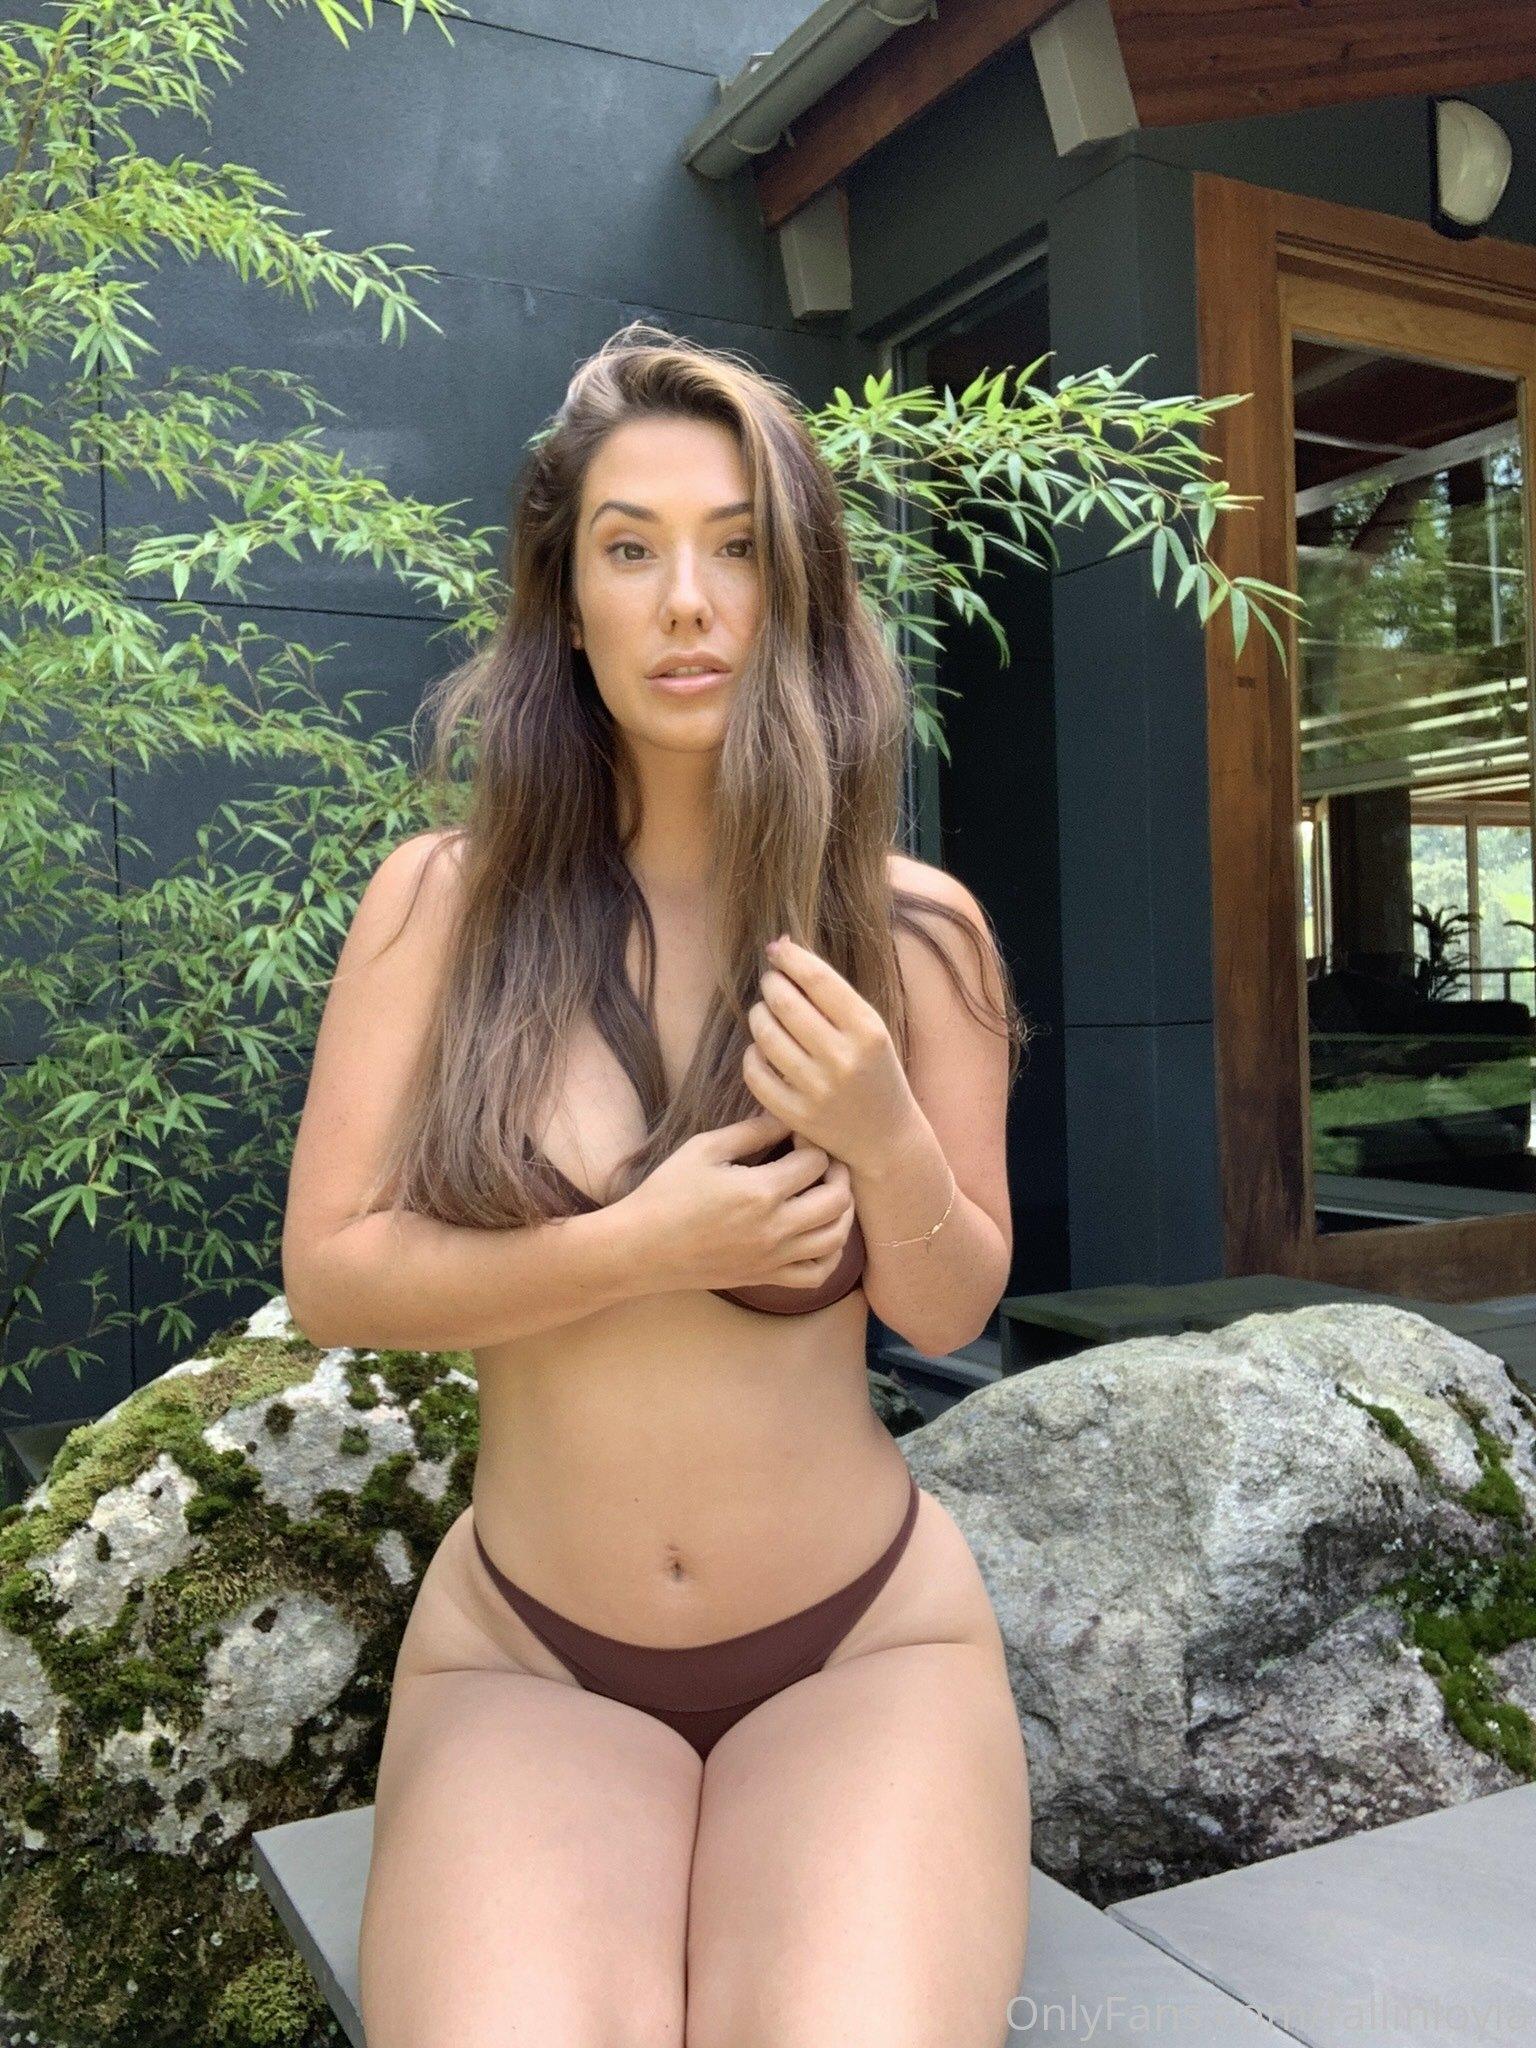 Eva Lovia, Fallinlovia, Onlyfans 0122